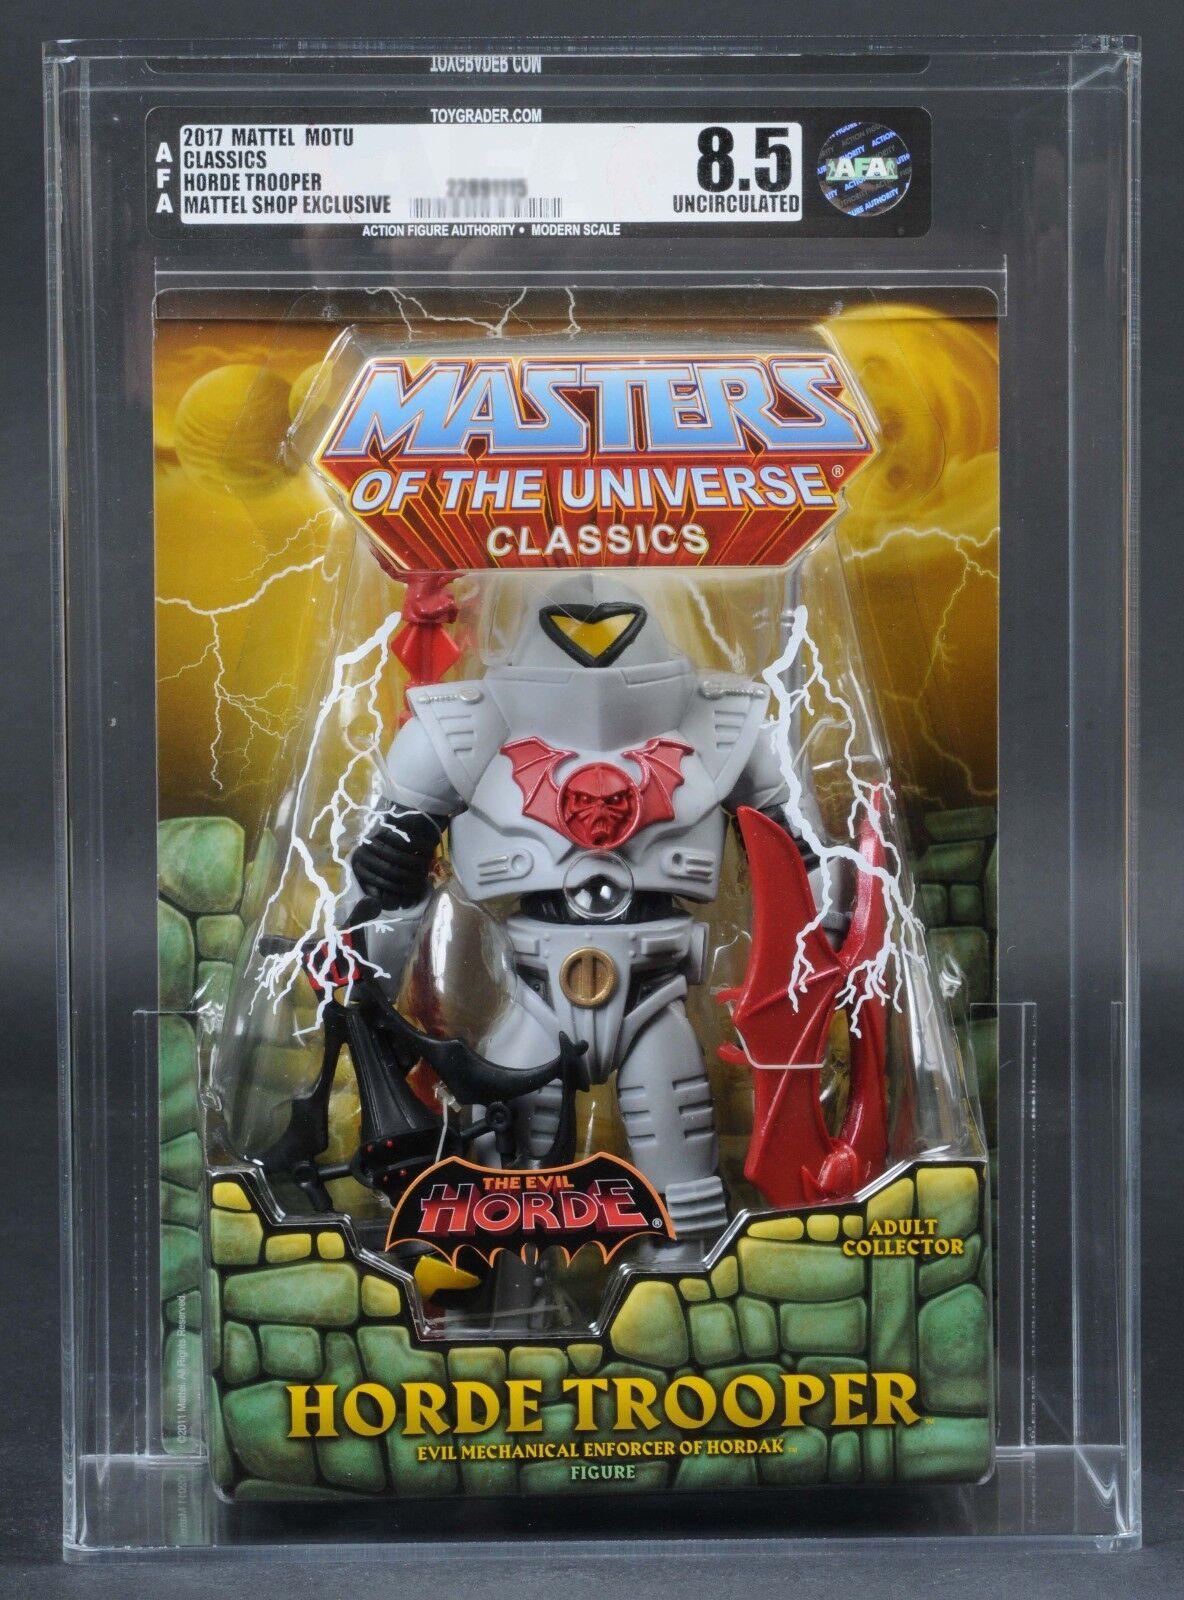 2017 Mattel MOTU Horde Trooper AFA U8.5 MOTUC MOTUC MOTUC Masters of the Universe Classics a3f20f